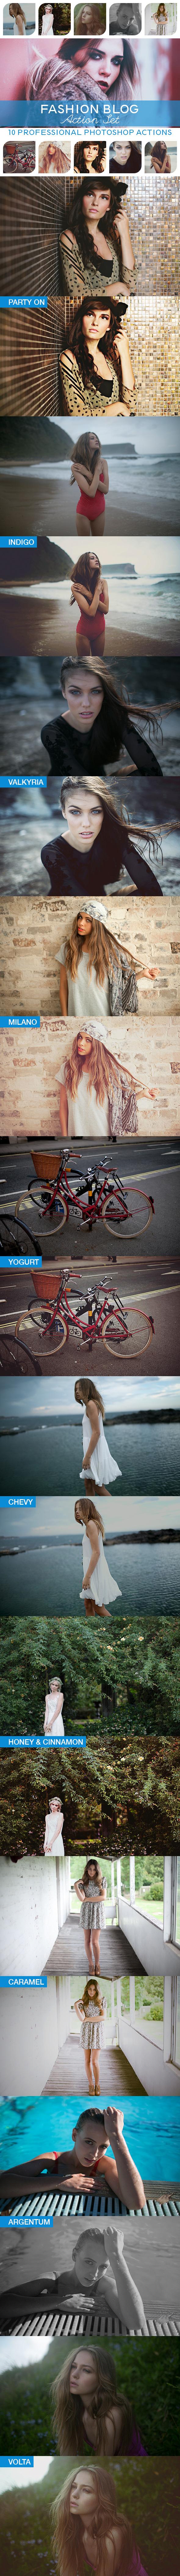 GraphicRiver 10 PRO Photoshop Actions Vol.IV 10748306